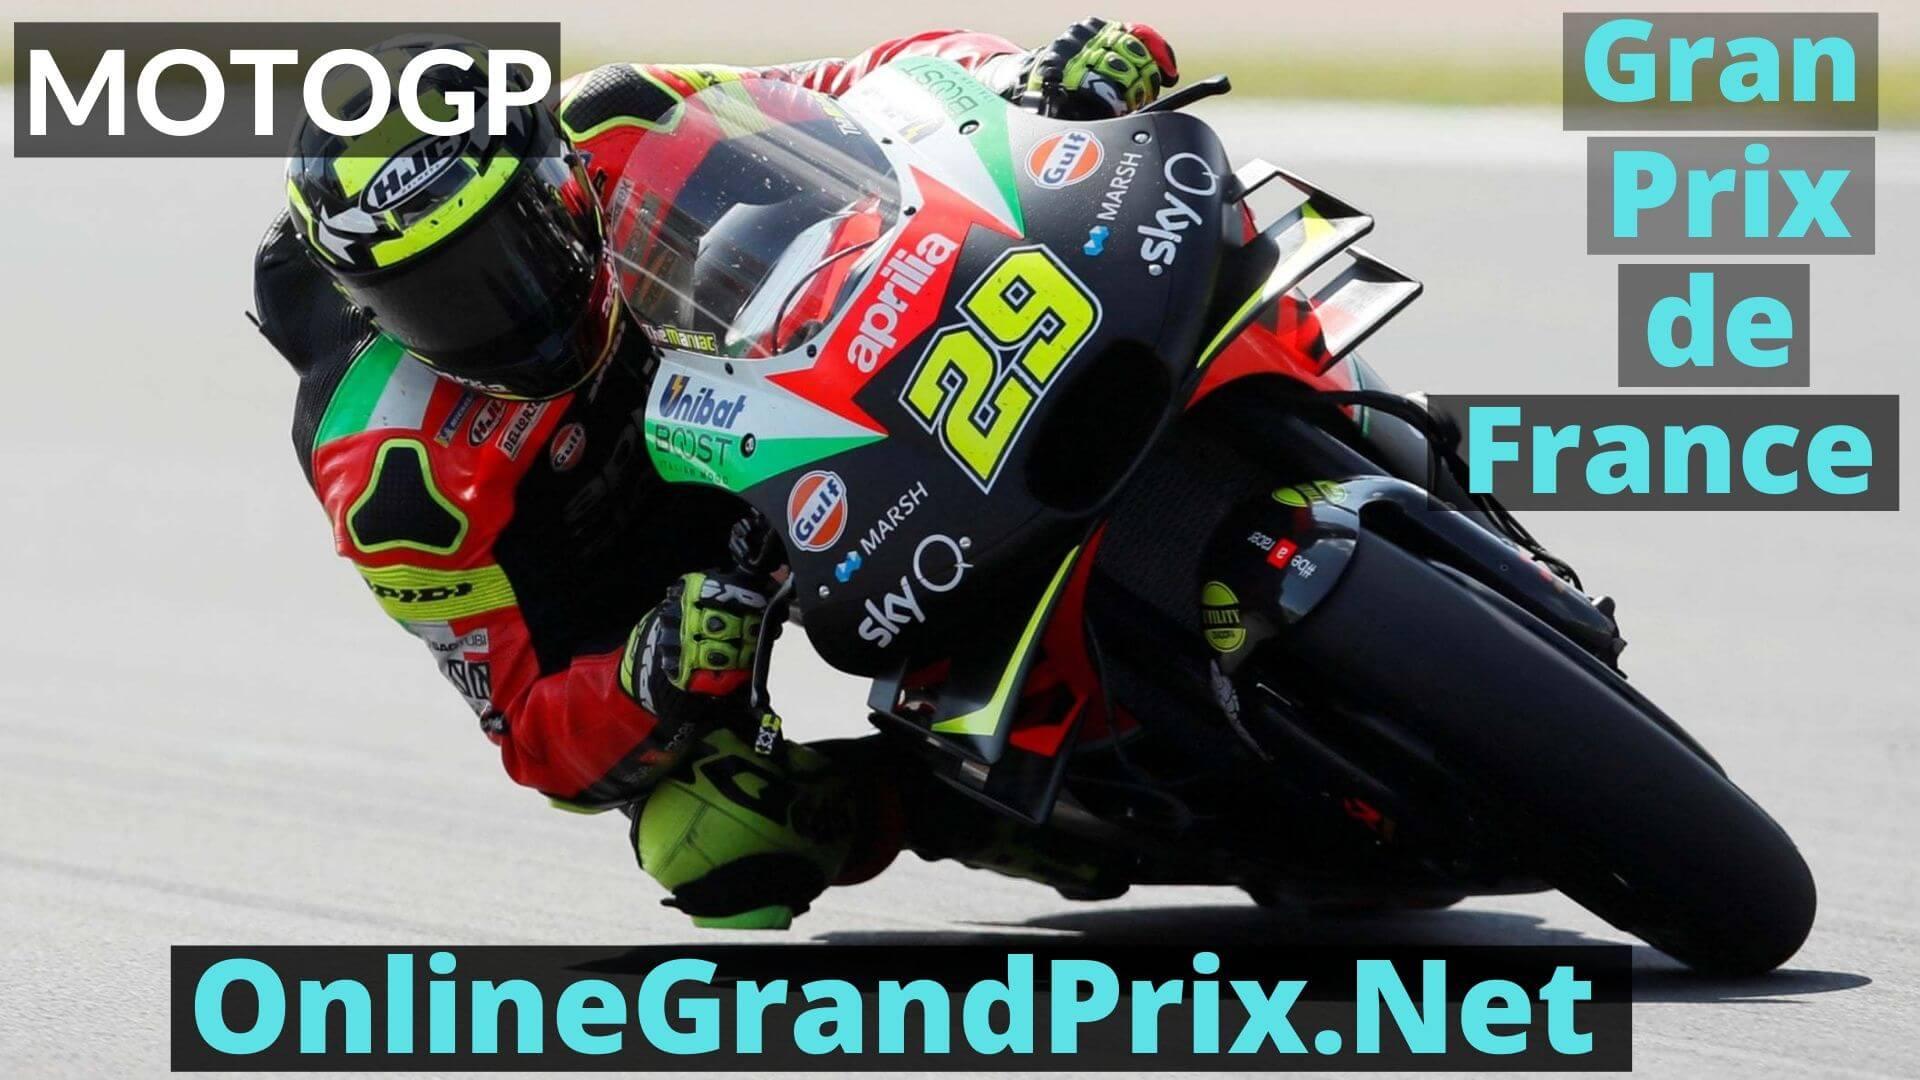 live-2015-monster-energy-grand-prix-de-france-online